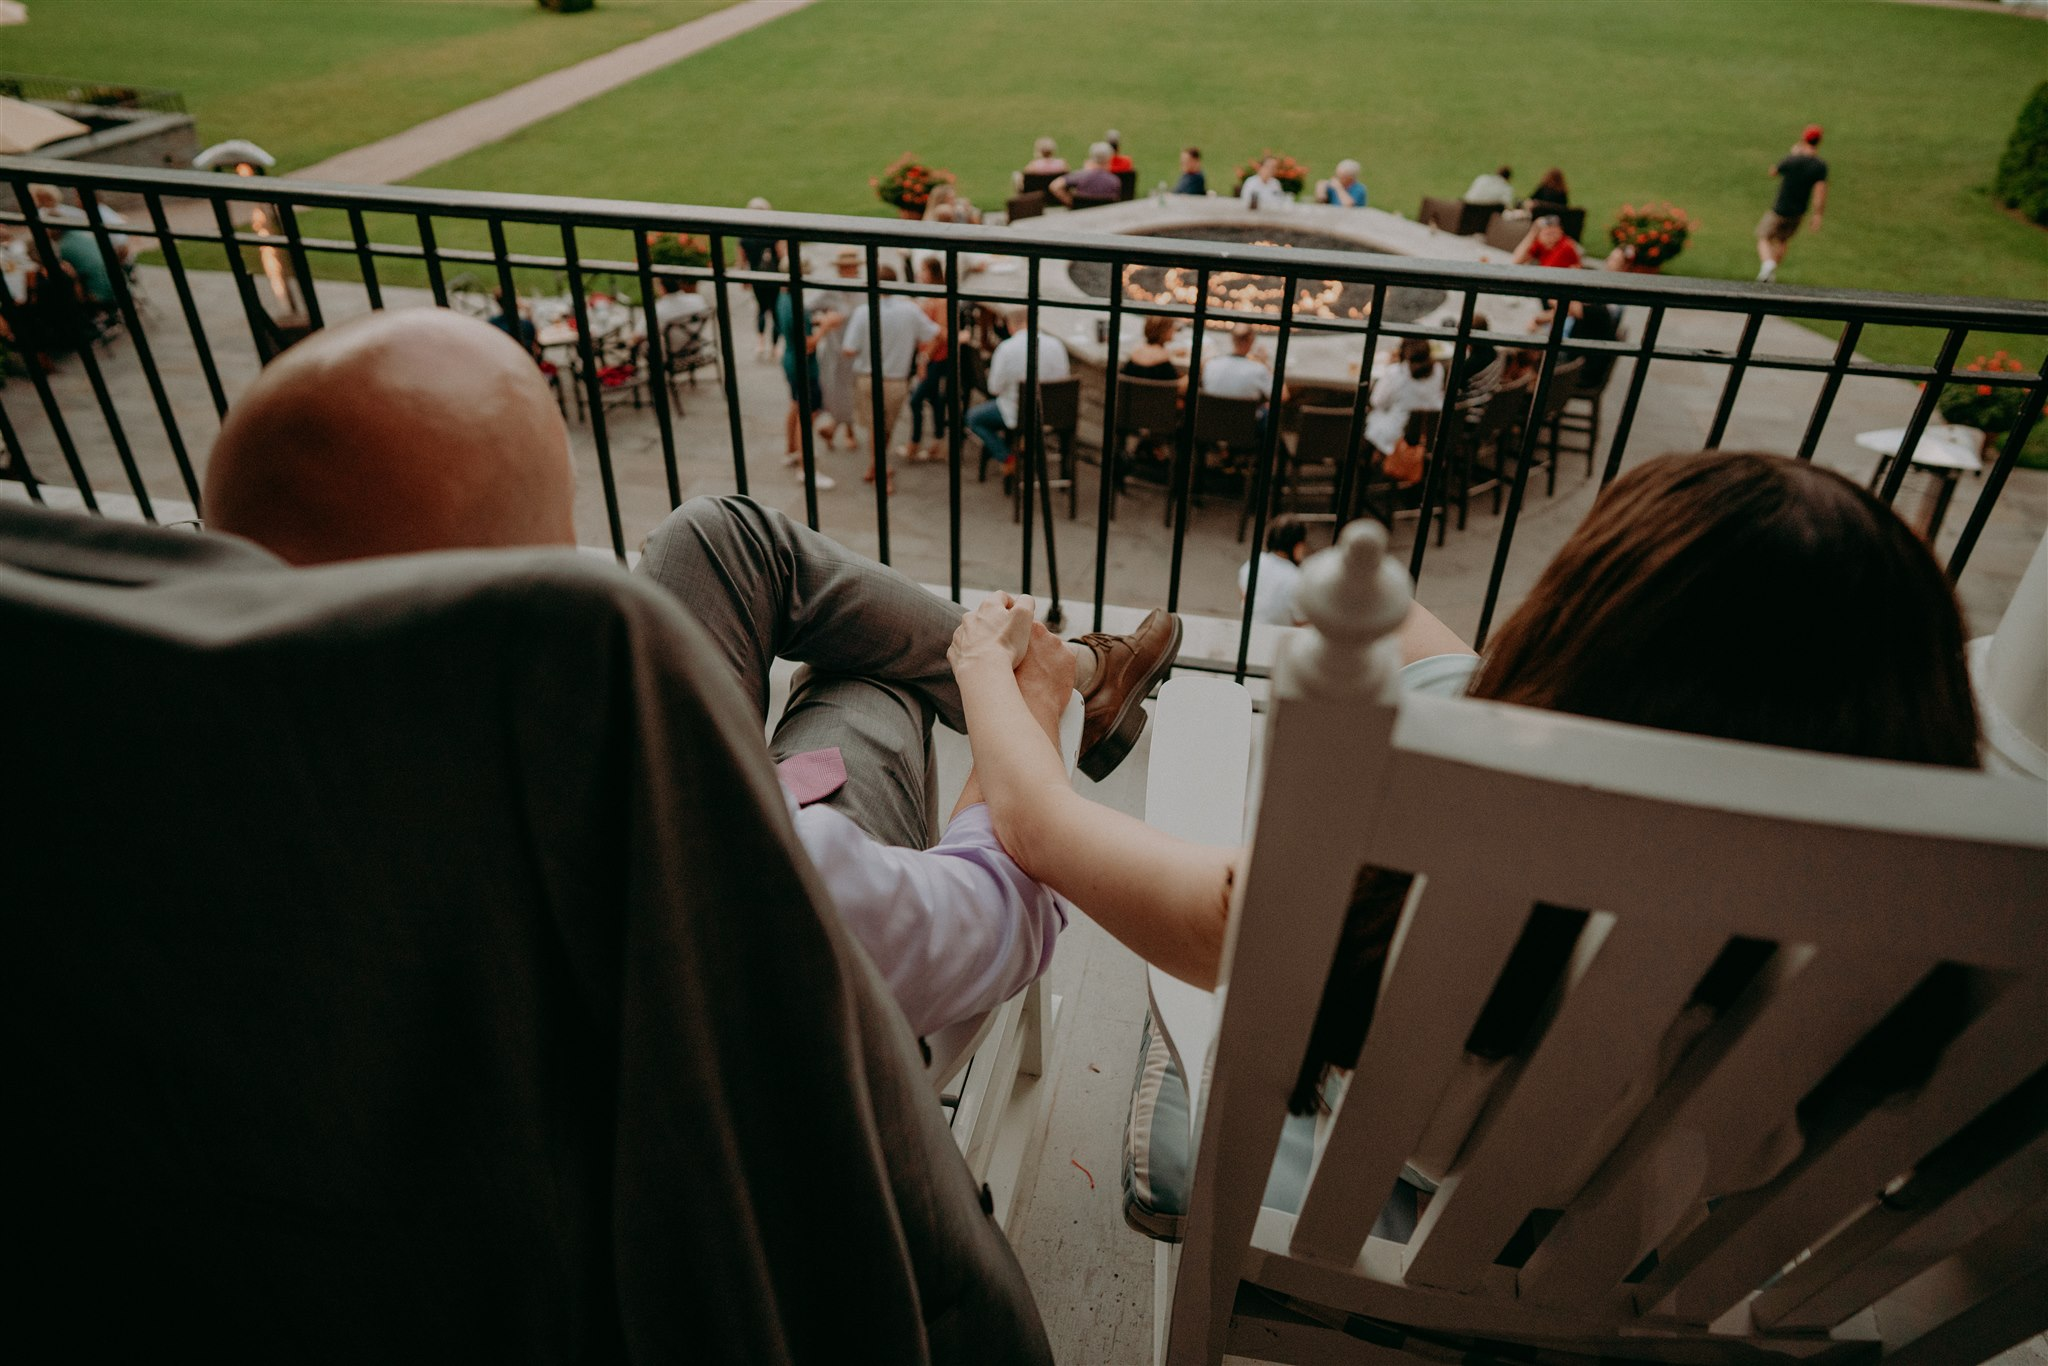 Chellise_Michael_Photography_Hudson_Valley_Wedding_Photographer_Otesaga_Hotel-6072.jpg